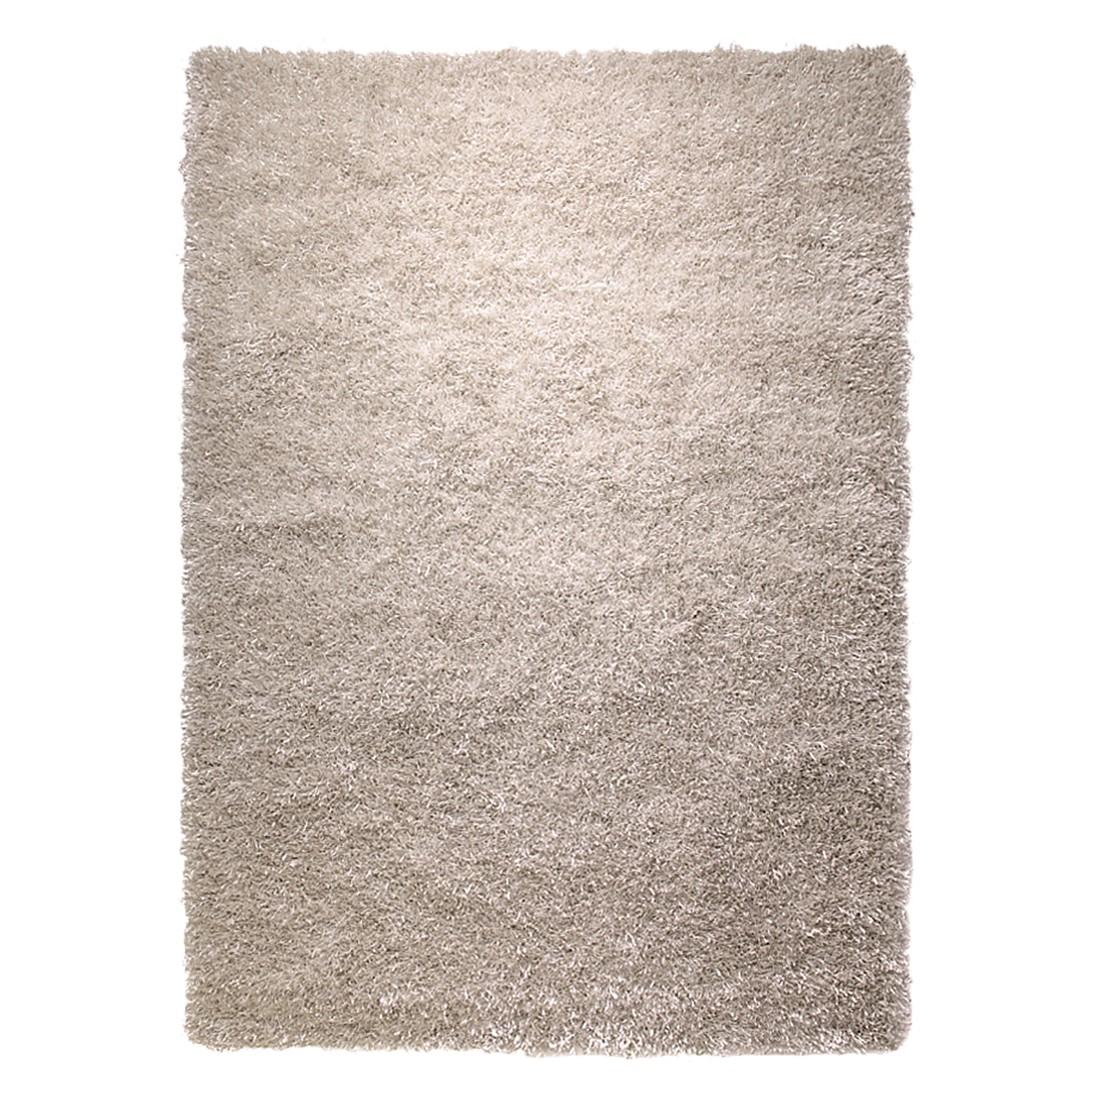 Teppich ESPRIT Cool Glamour – Chrystal – 200 x 300 cm, Esprit Home günstig